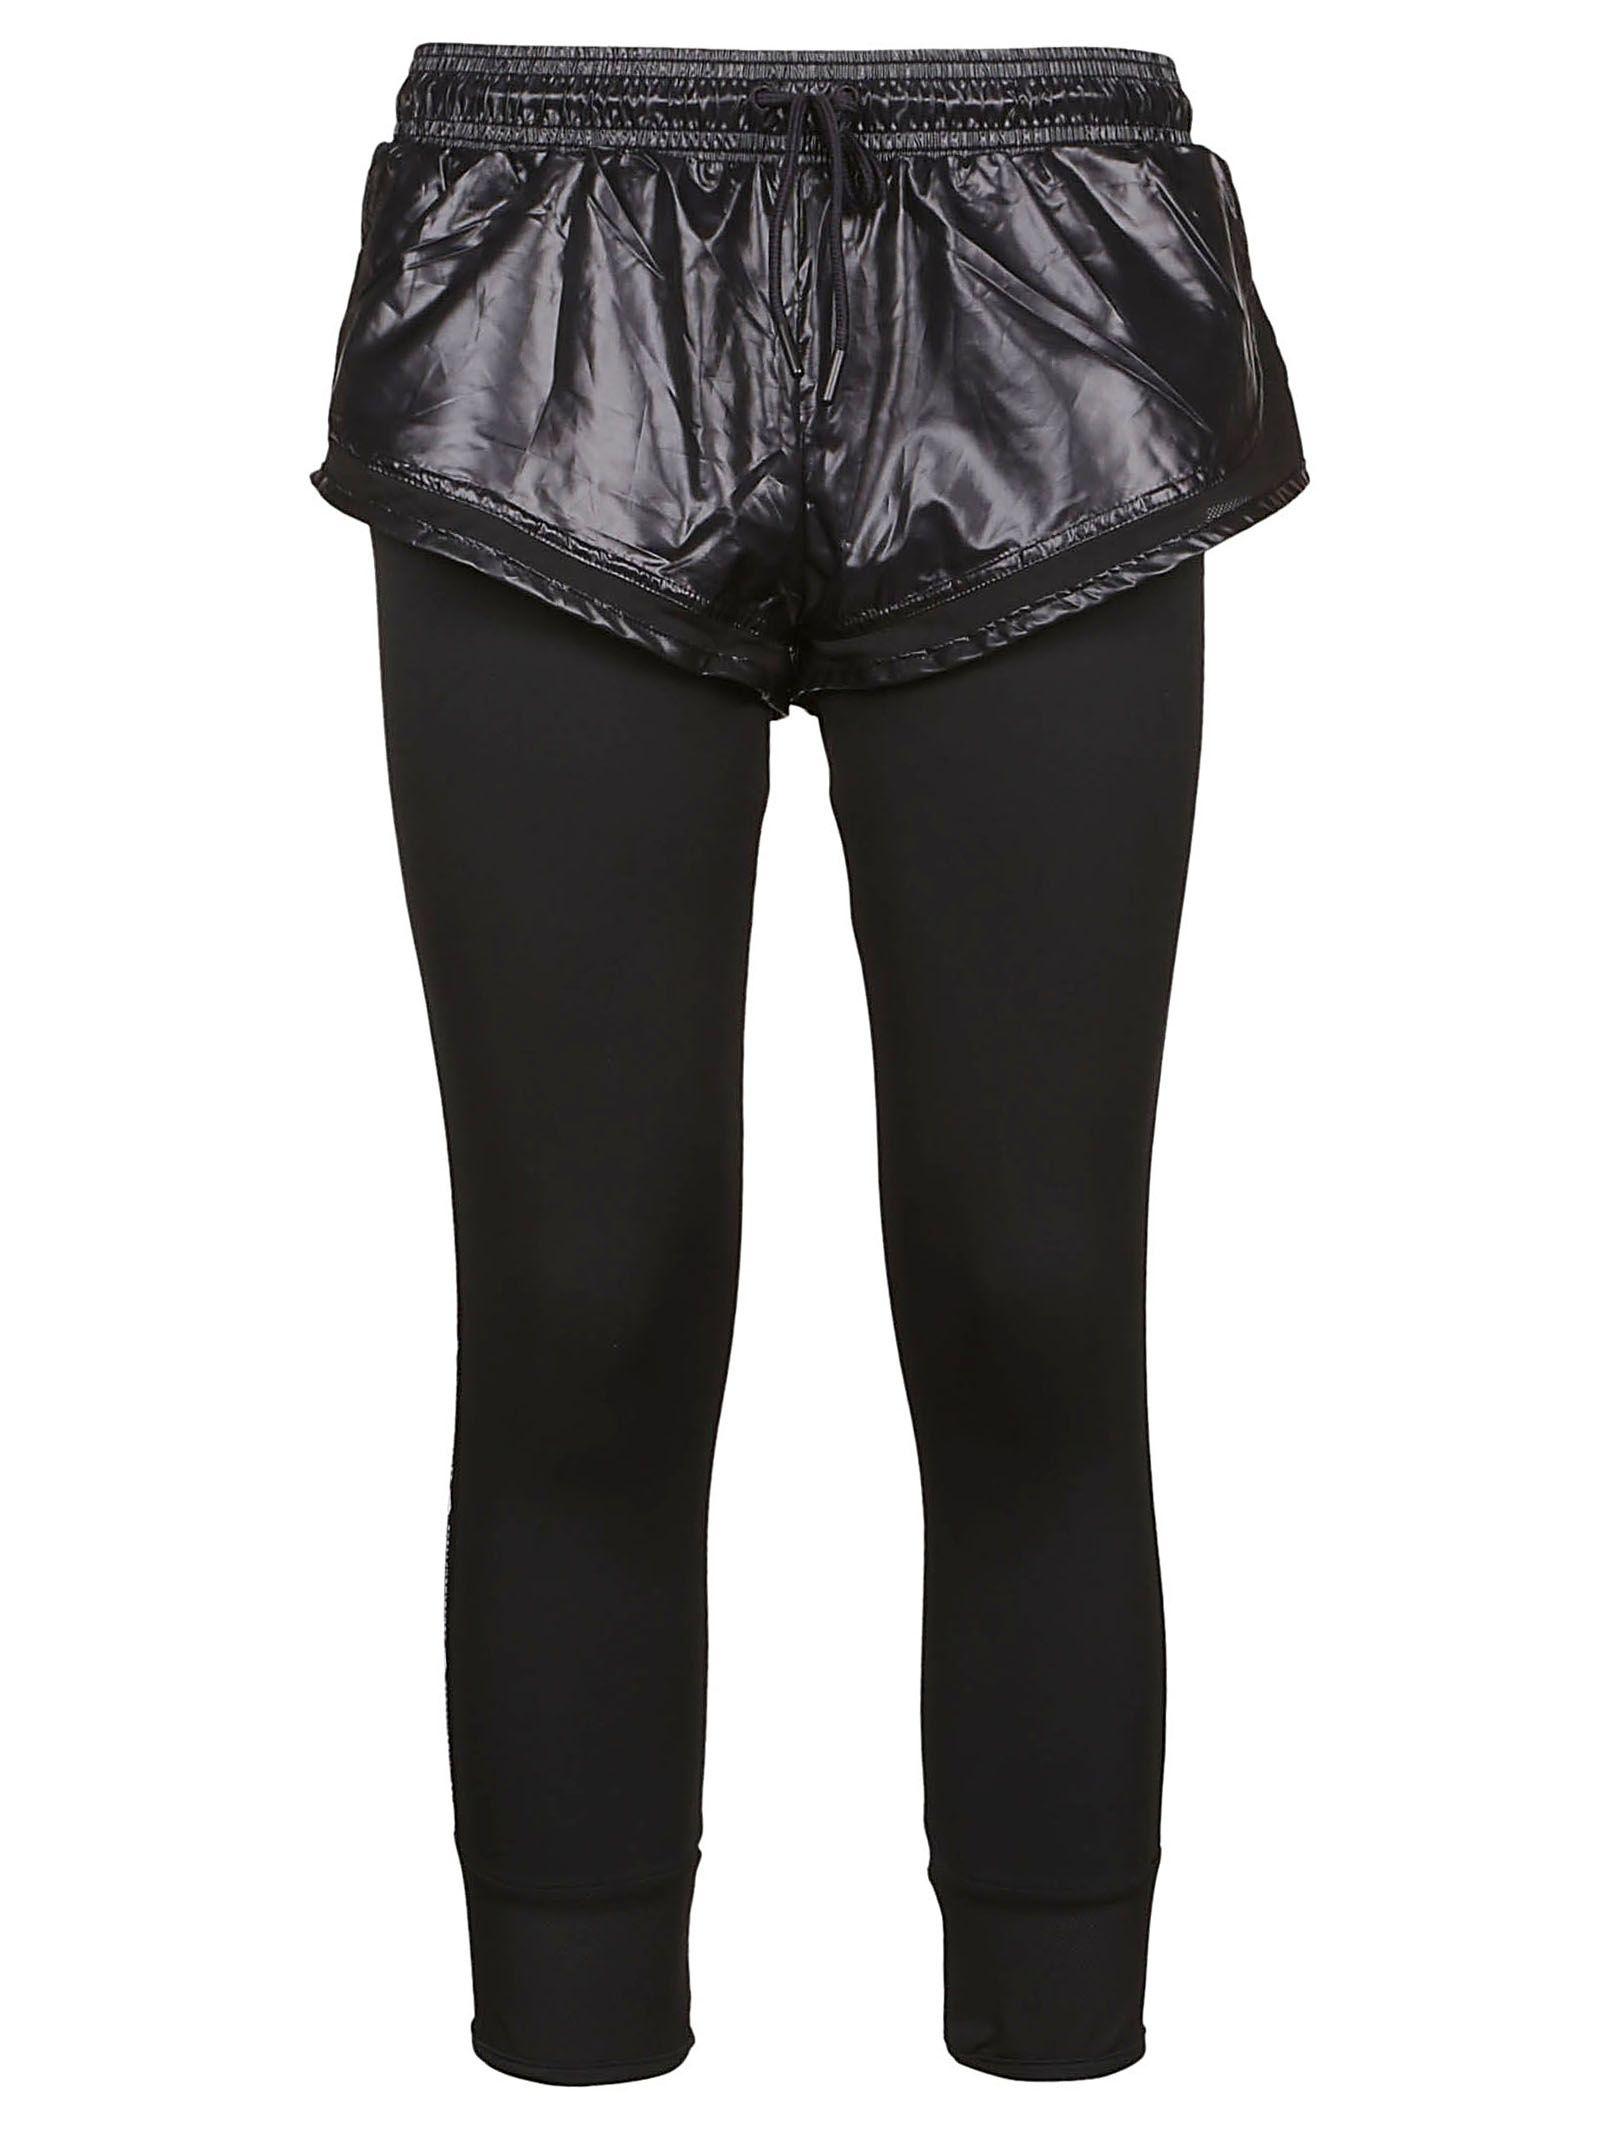 b9028ebc92e50 Adidas by Stella McCartney Performance Essentials Shorts Over Leggings -  Black ...